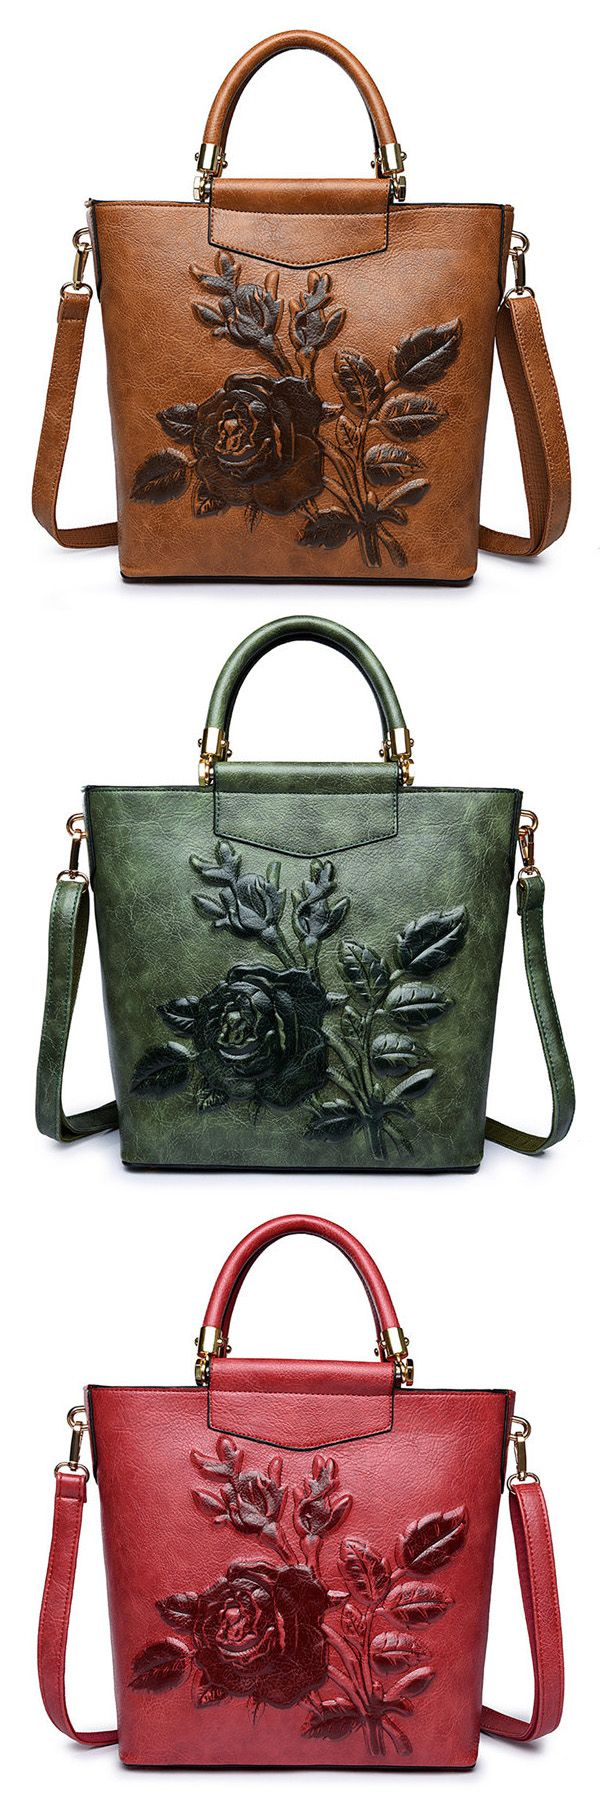 US$46.32  Elegant National Style Flower Pattern Shoulder Bags Crossbody Bags For Women #ShoulderBags #WomenCrossbodyBags #WomensHandBags